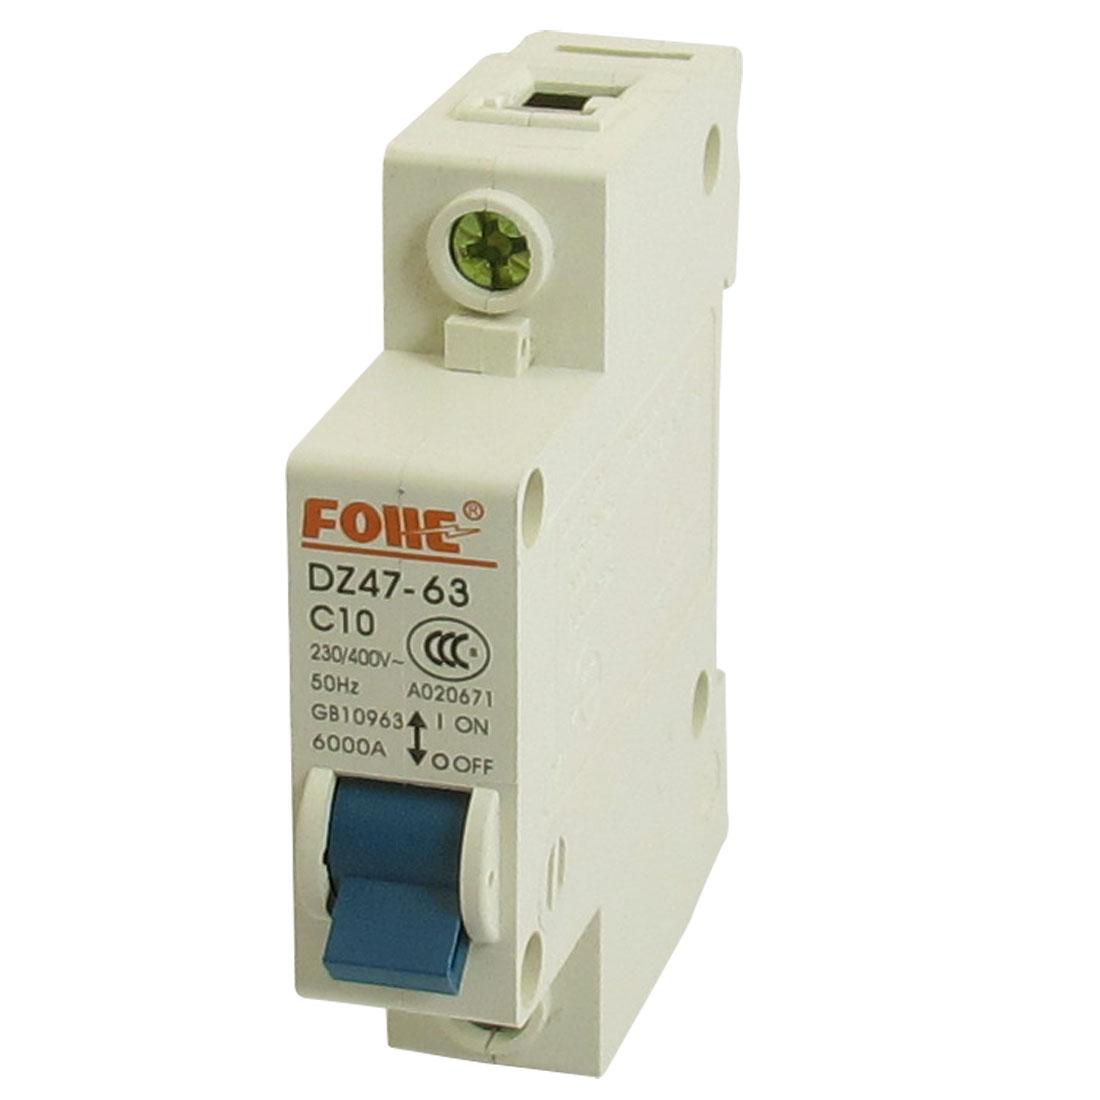 AC 230/400V 10A 6000A 1P 1 Pole Miniature Circuit Breaker DIN Rail DZ47-63 C10